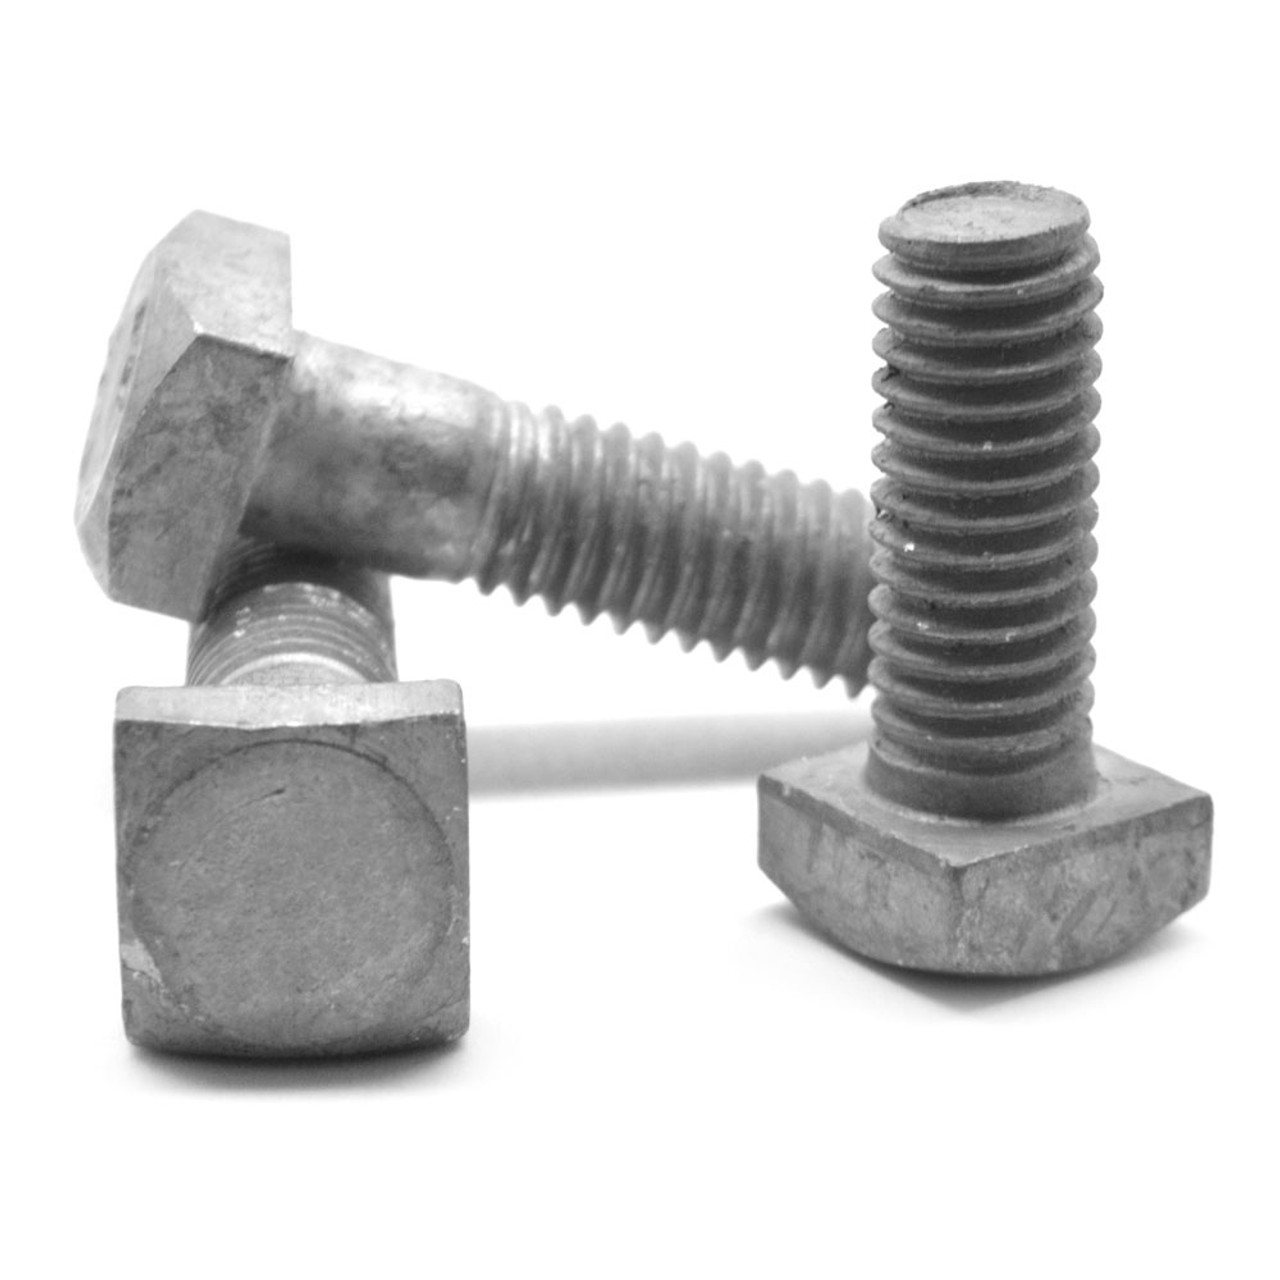 "1""-8 x 12"" A307 Grade A Square Head Machine Bolt Low Carbon Steel Hot Dip Galvanized"